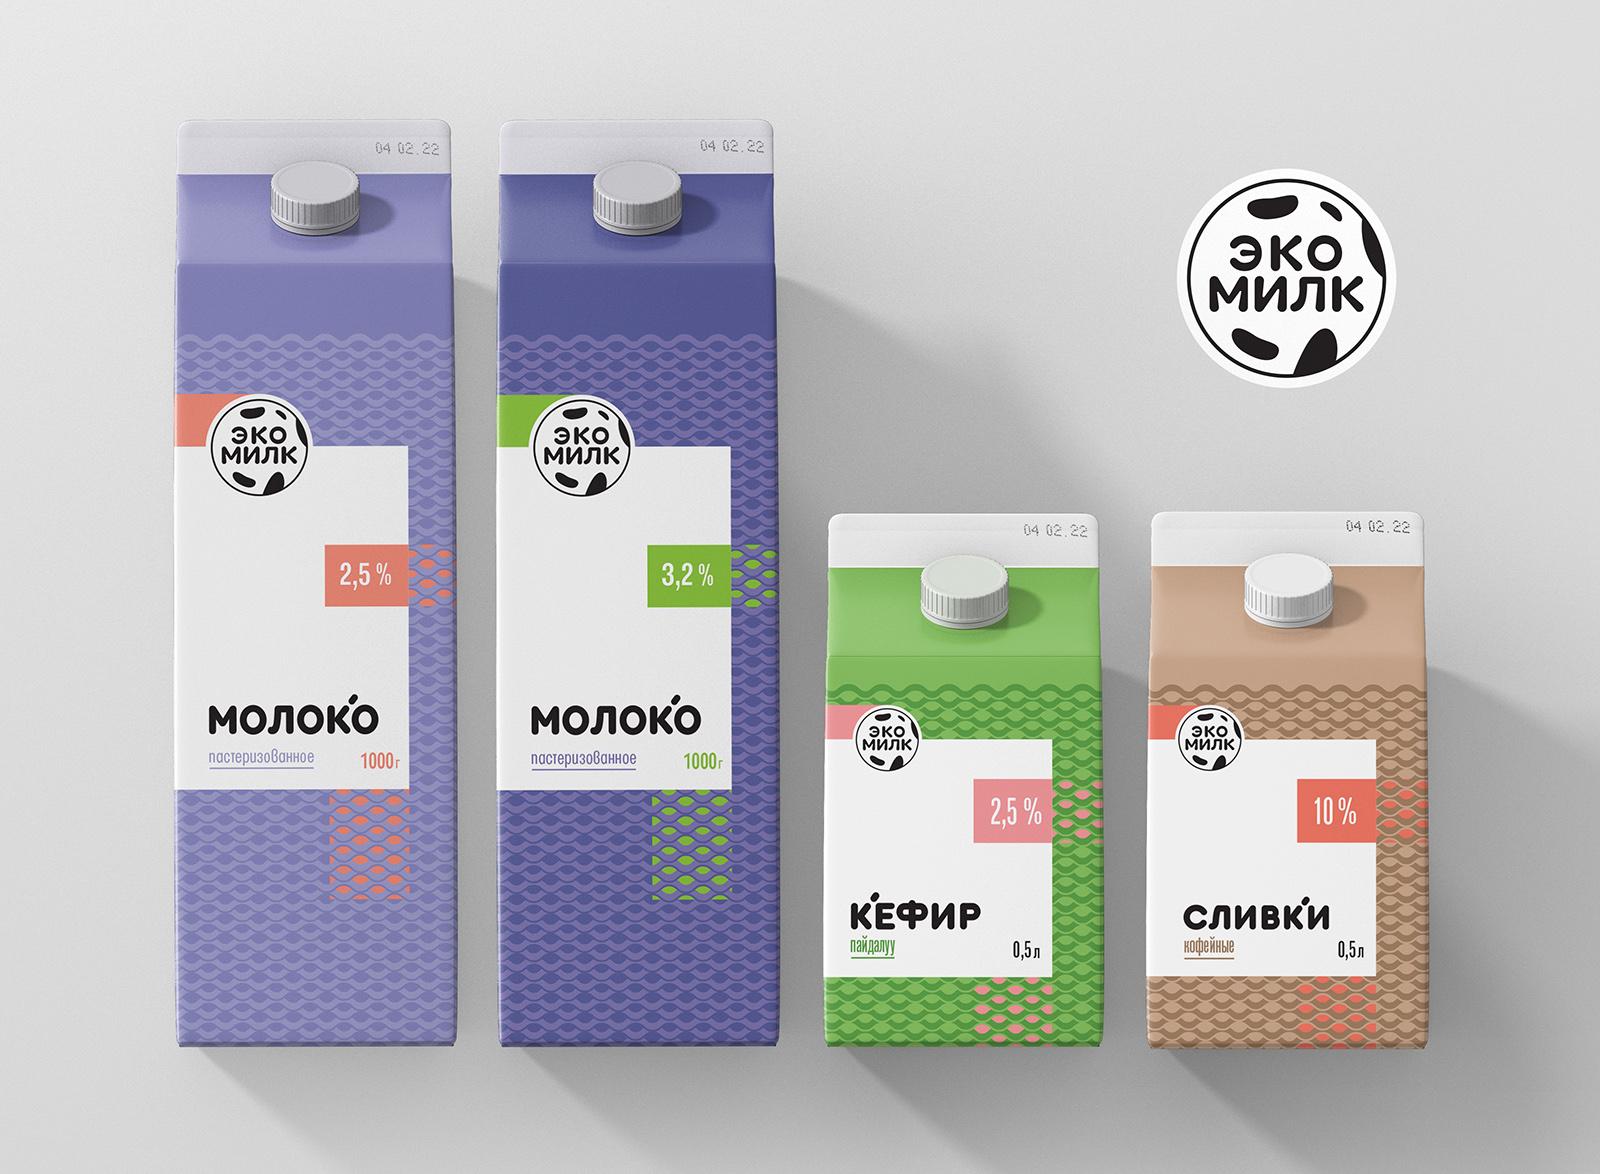 EkoMilk Brand Identity and Packaging Design by Alexey Lysogorov